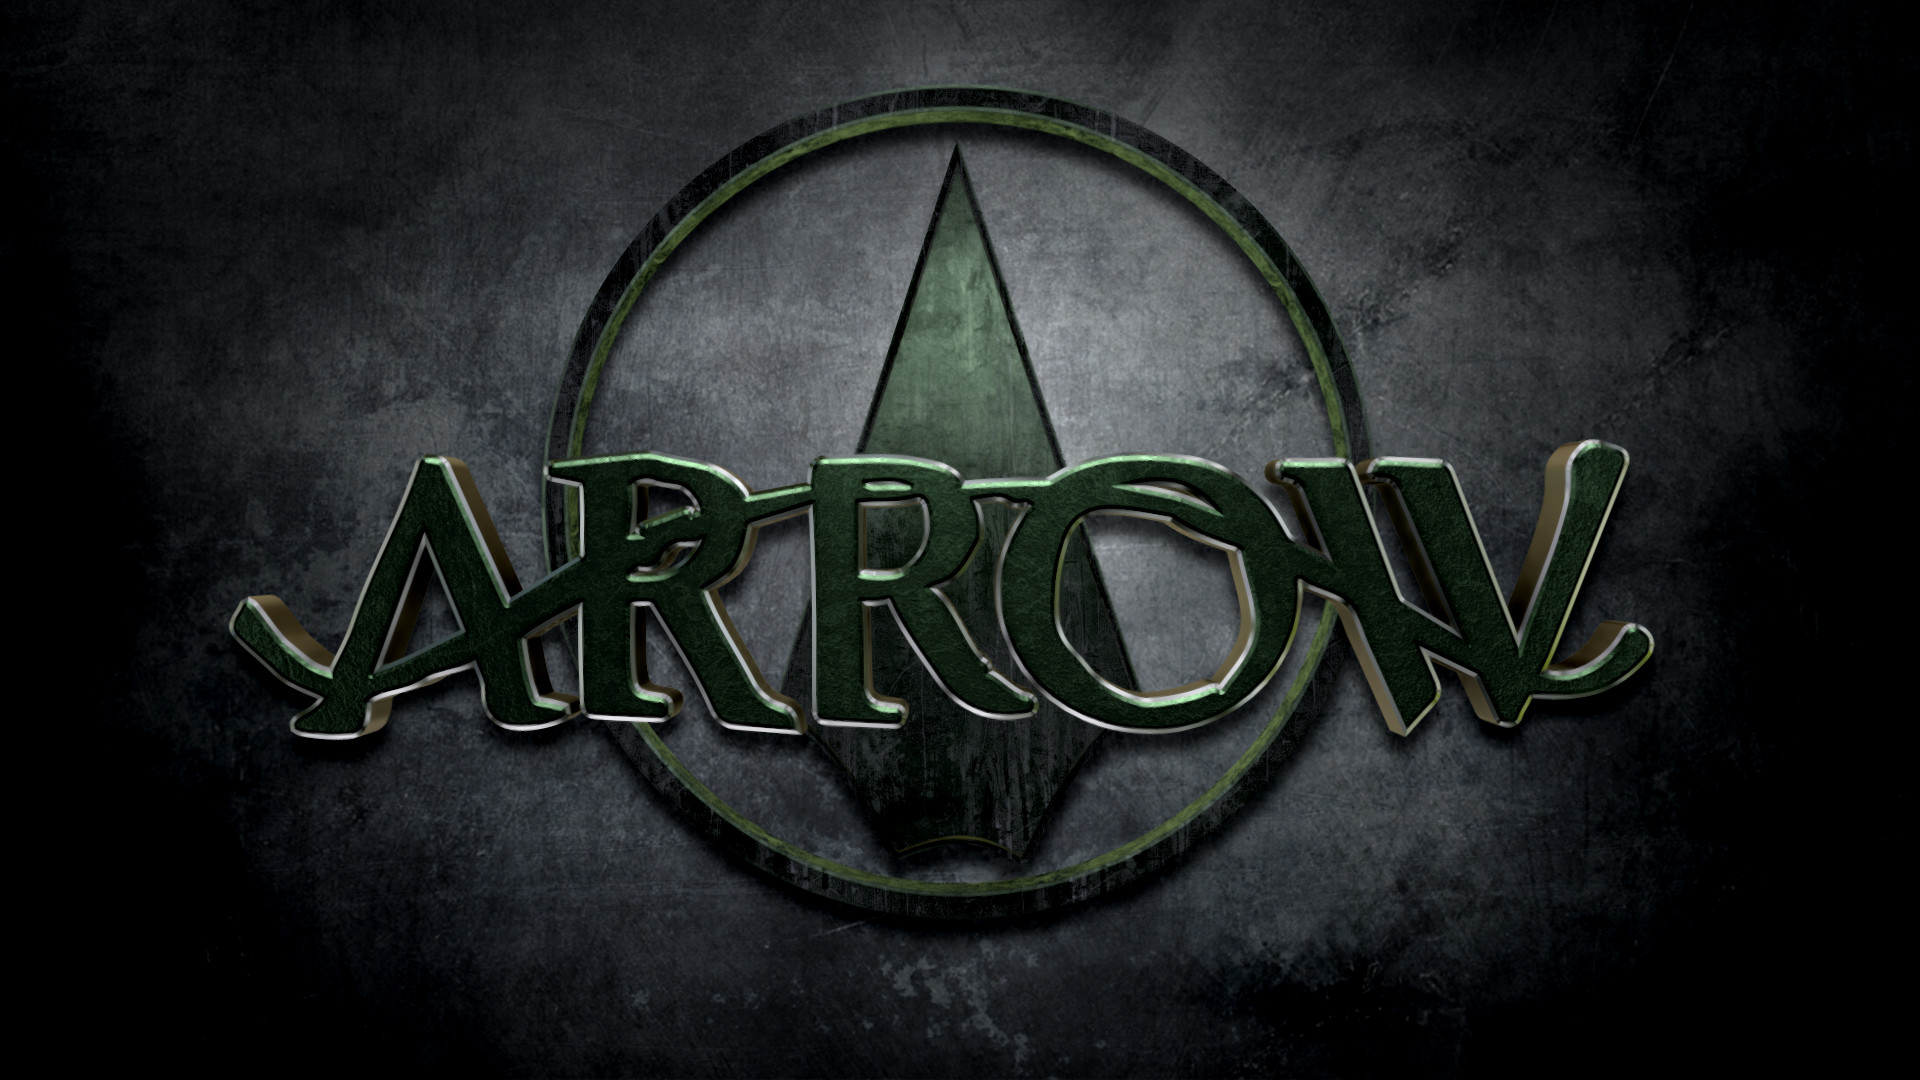 1920x1080 green arrow wallpaper